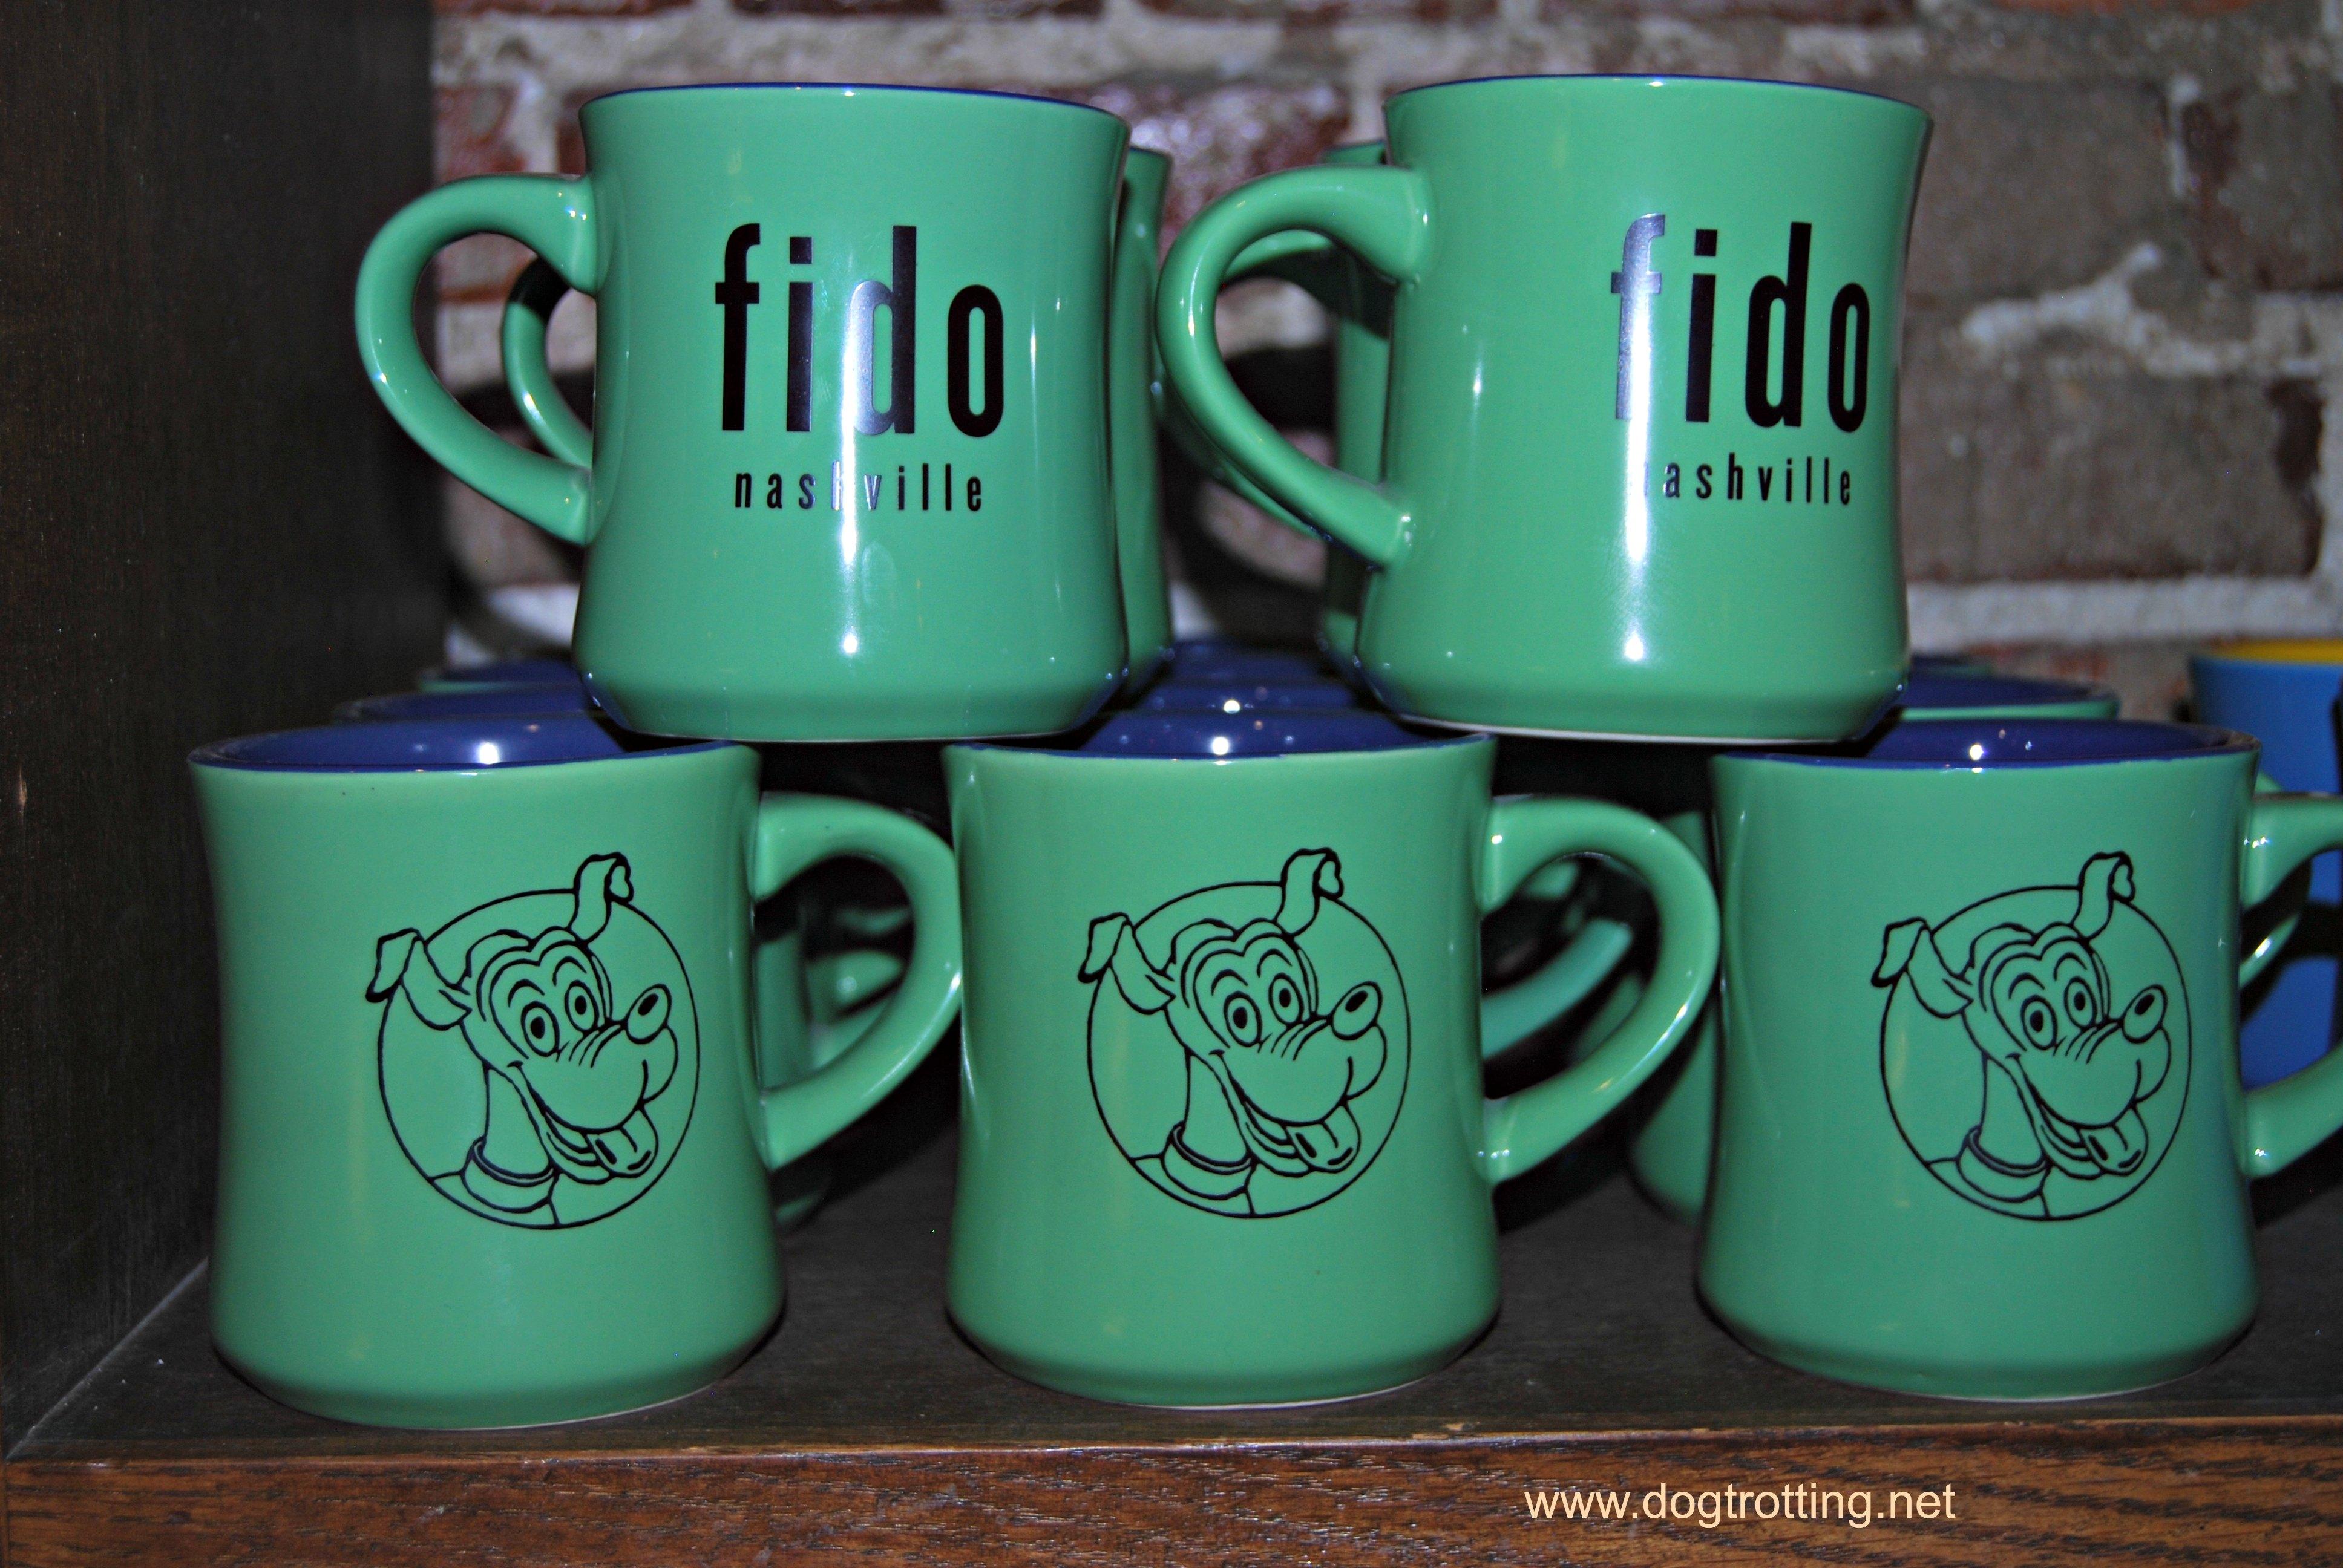 Mugs at Fido coffee shop Nashville